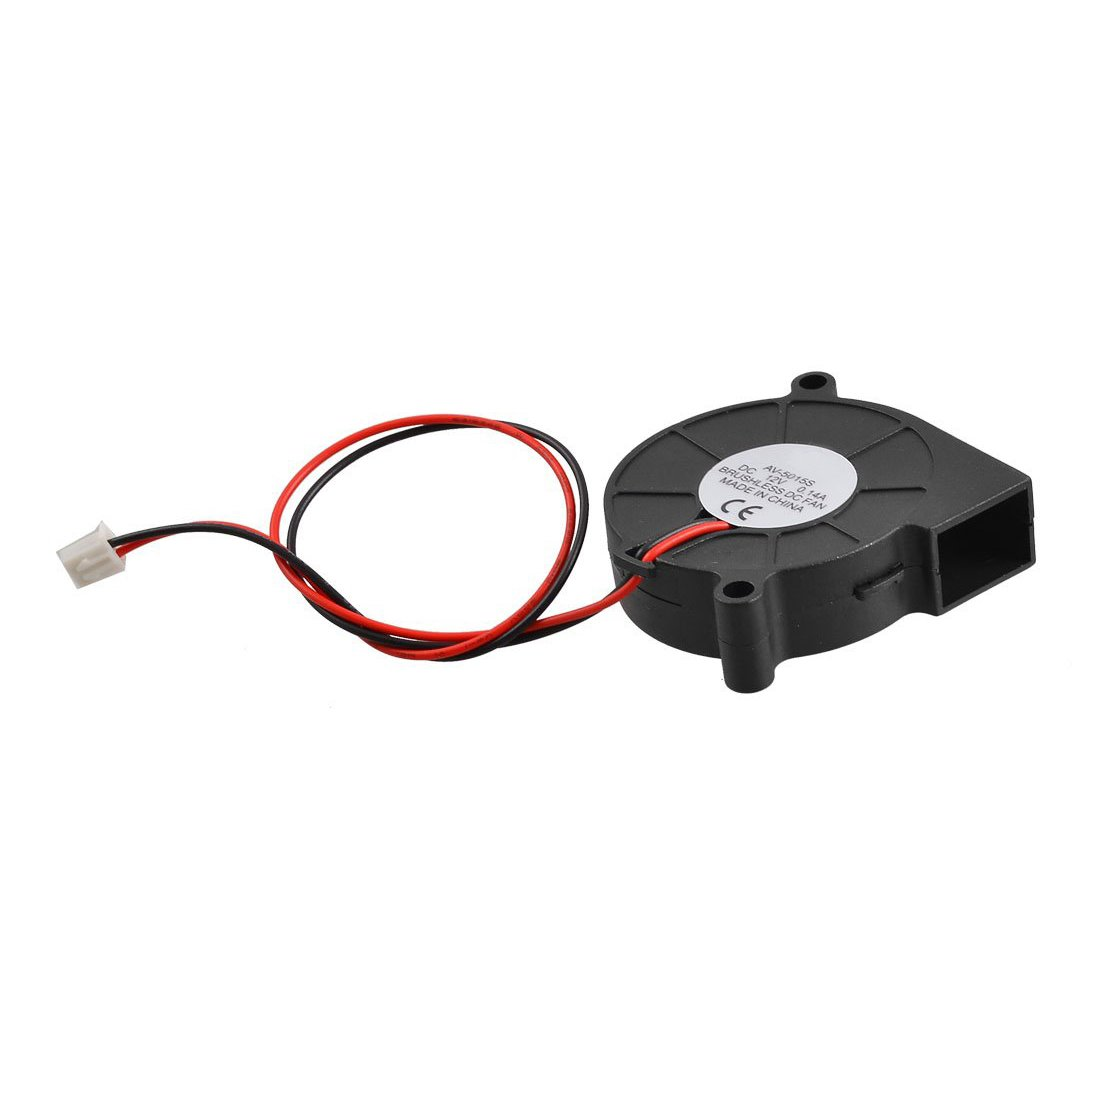 TOOGOO(R) Black Brushless DC Cooling Blower Fan 5015S 5V 0.14A 50mm x 15mm